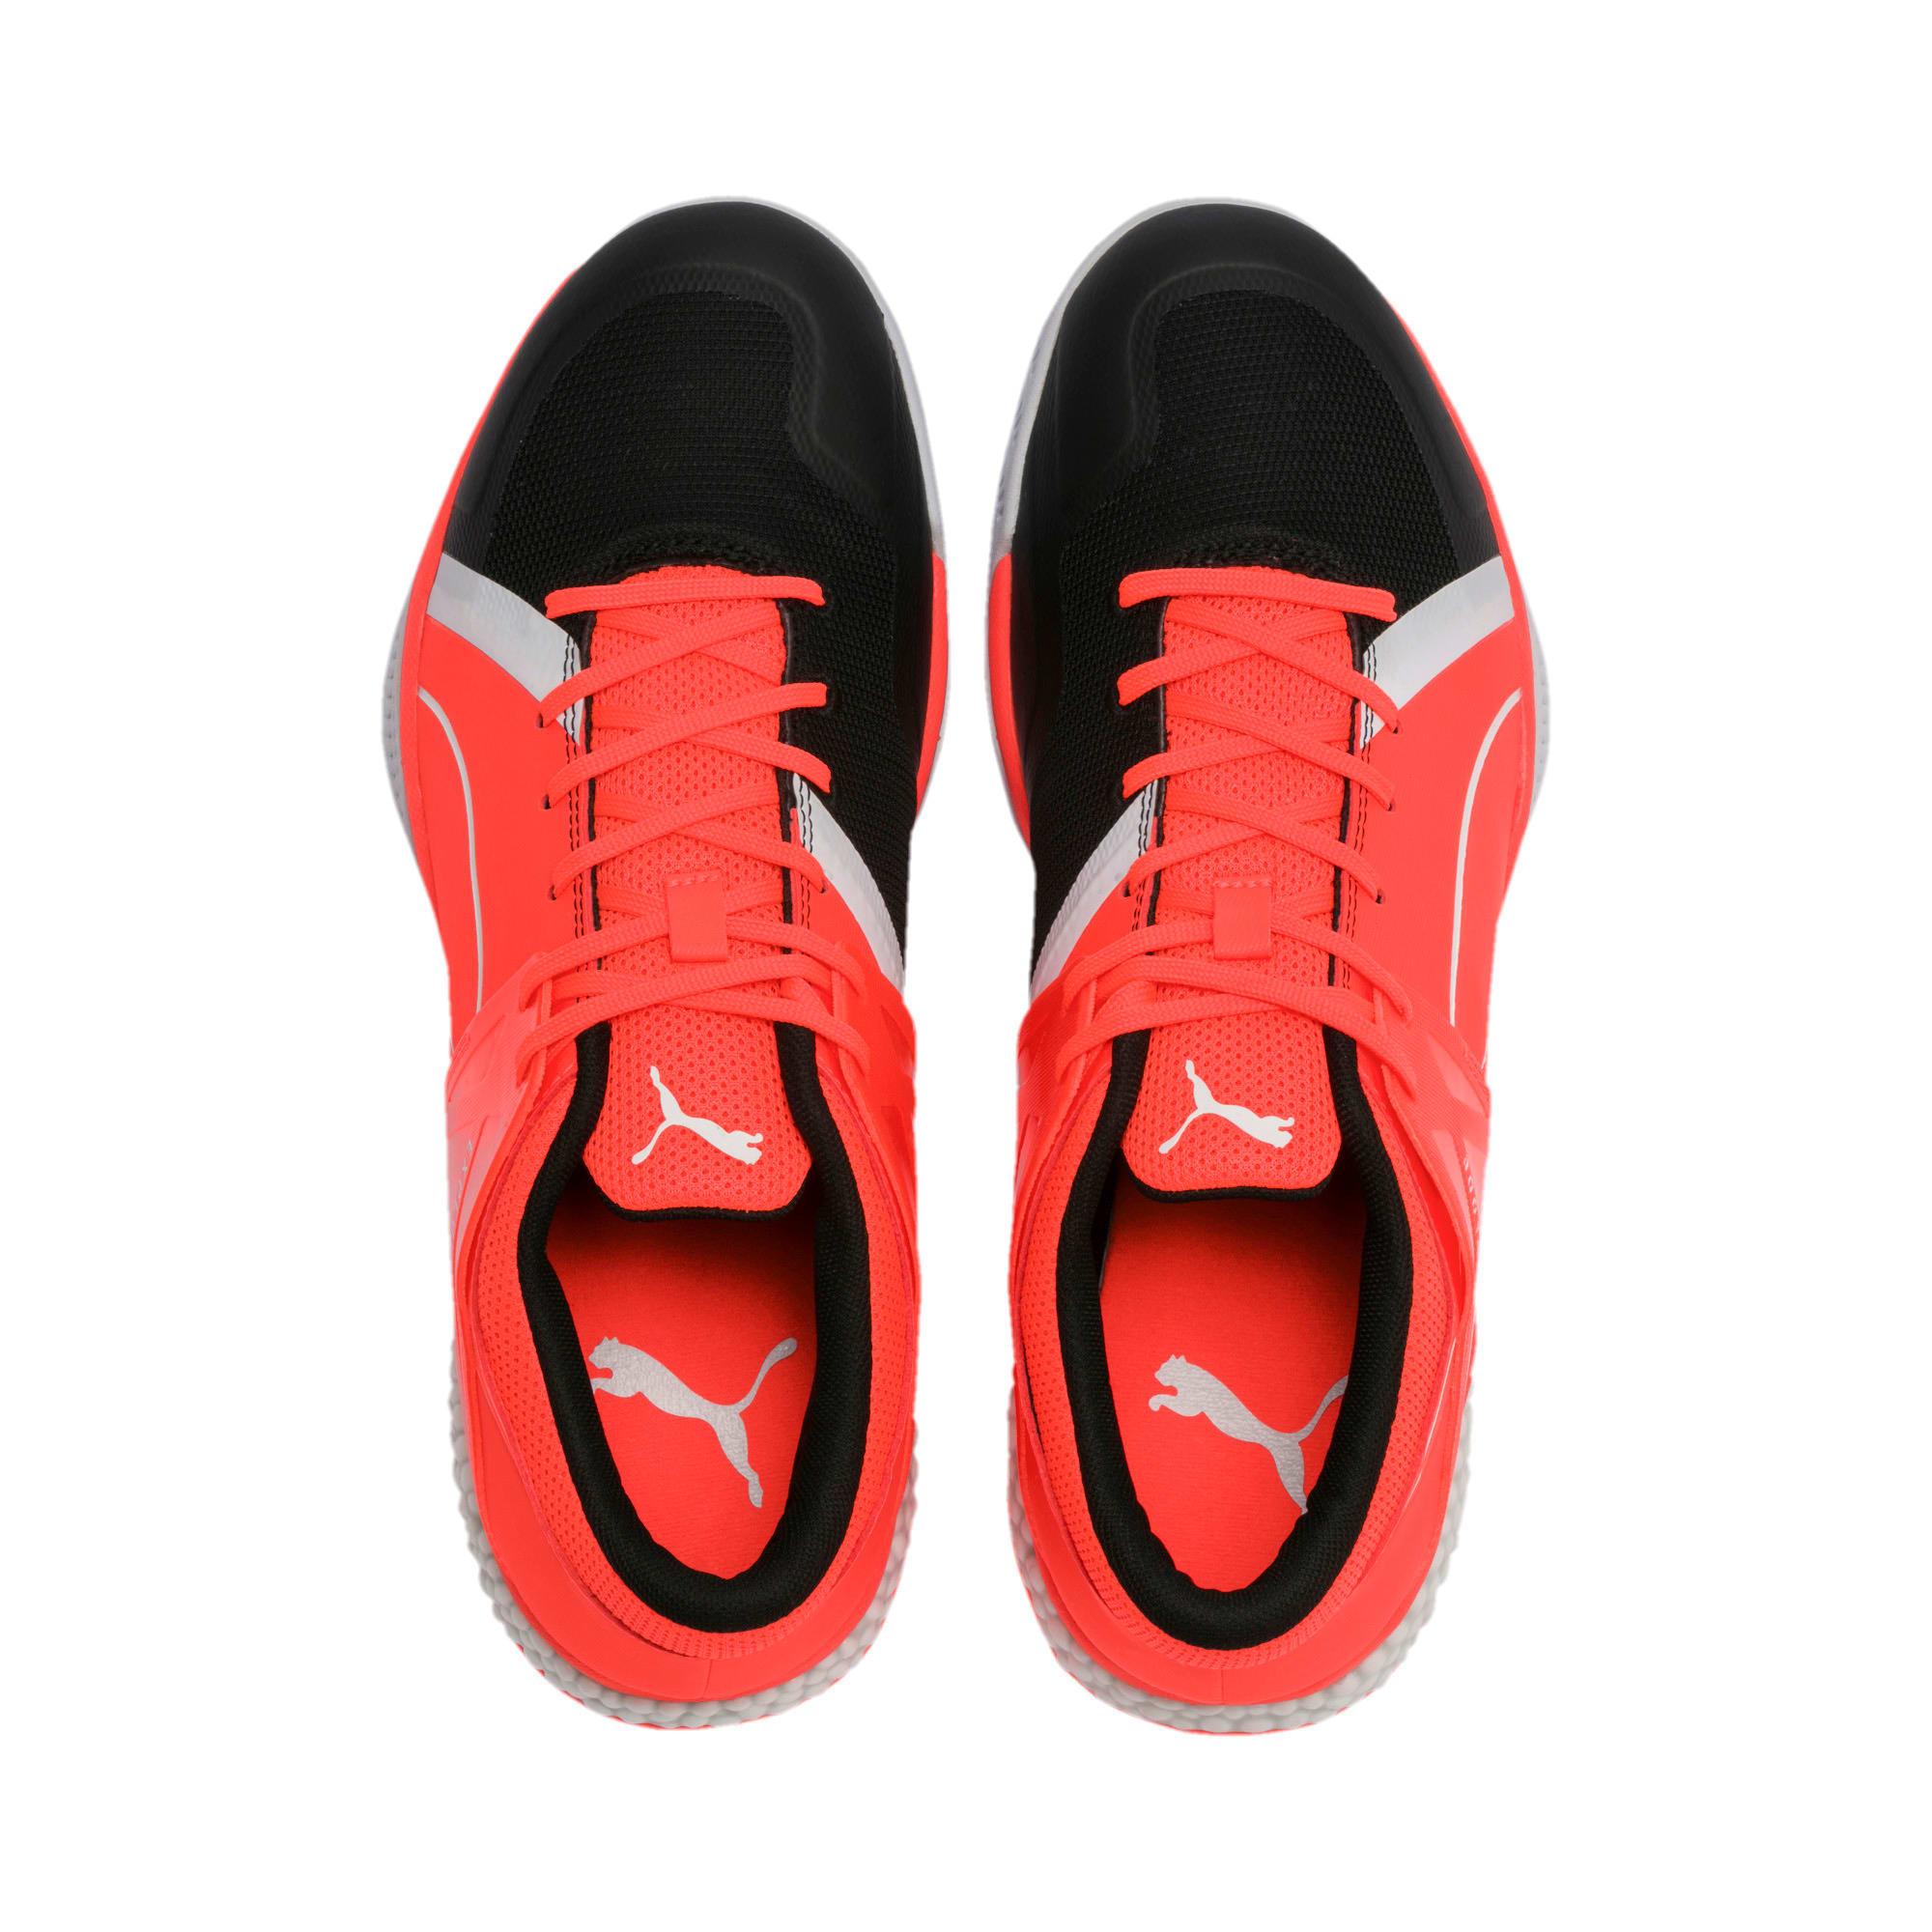 Thumbnail 7 of Chaussures Handball Explode XT Hybrid 2 Training, Black-Puma White-Nrgy Red, medium